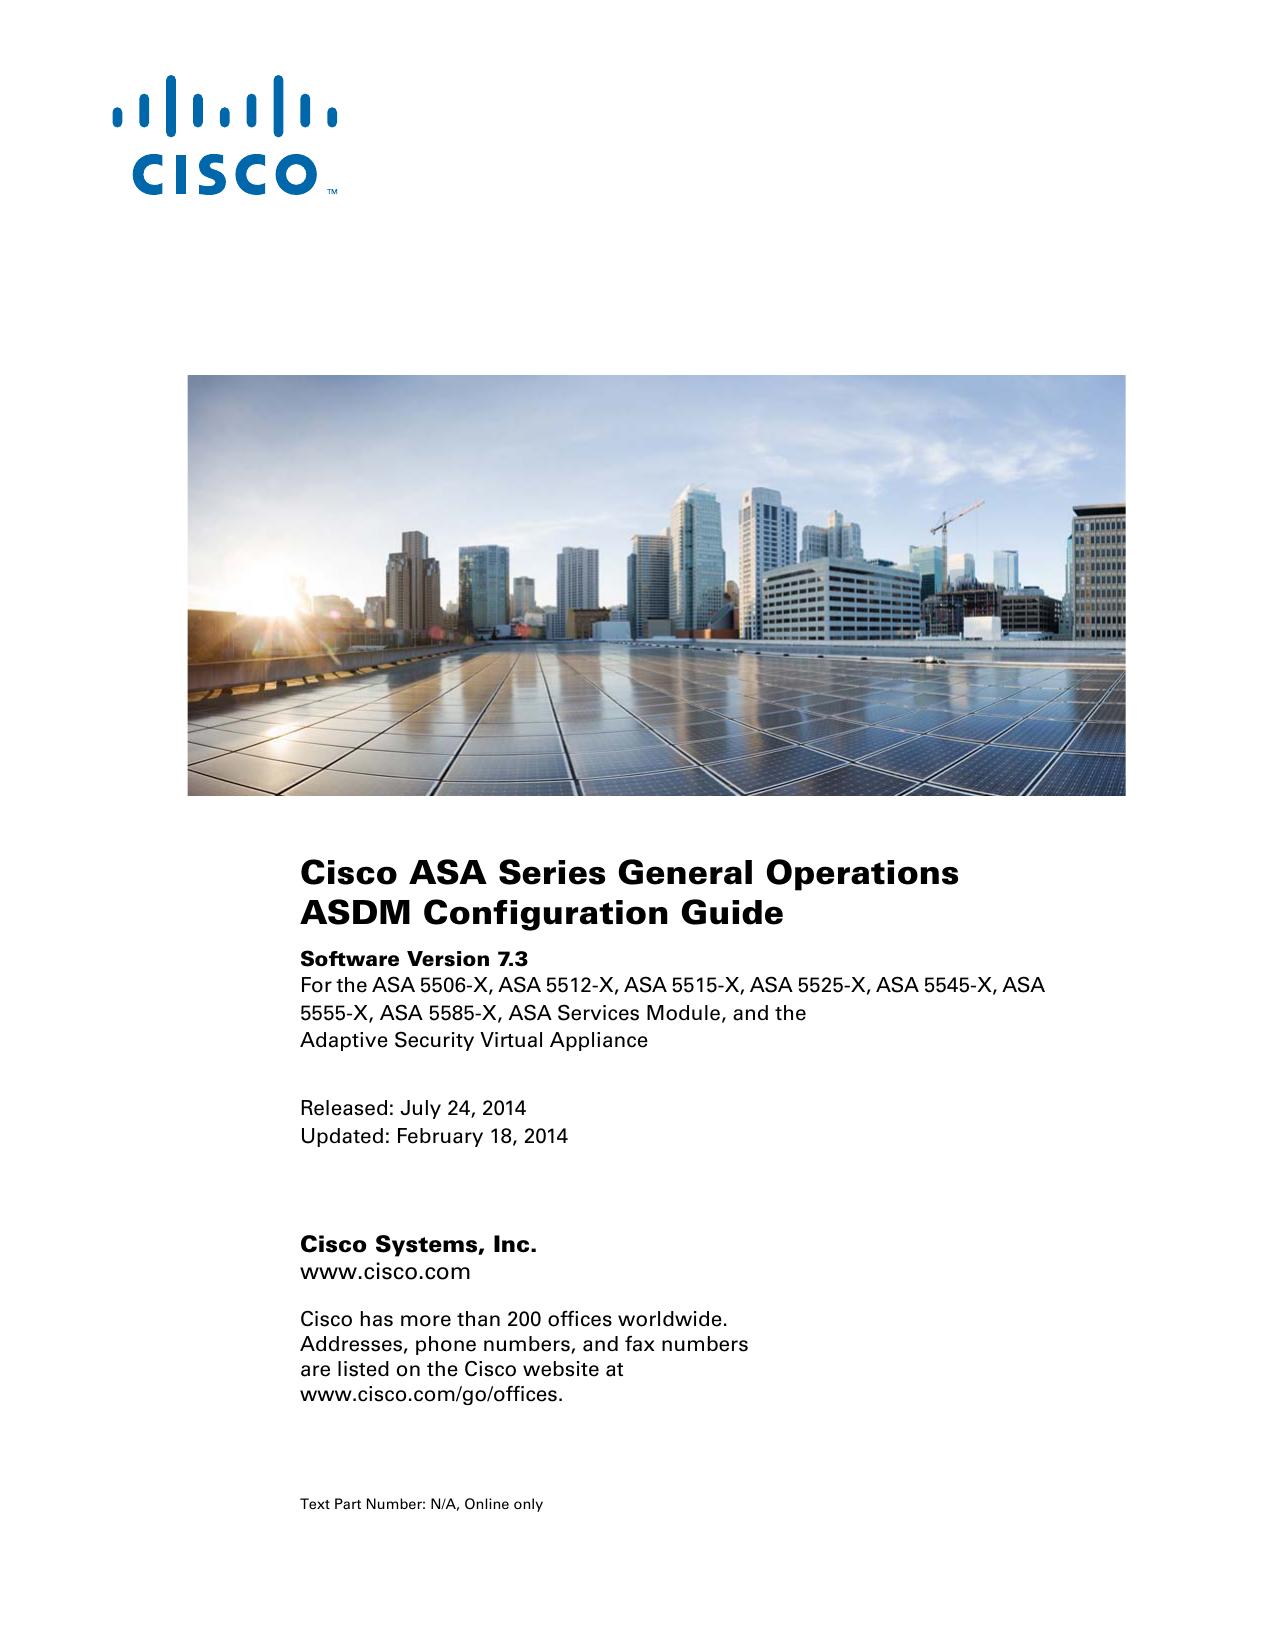 Cisco ASA Series General Operations ASDM Configuration Guide